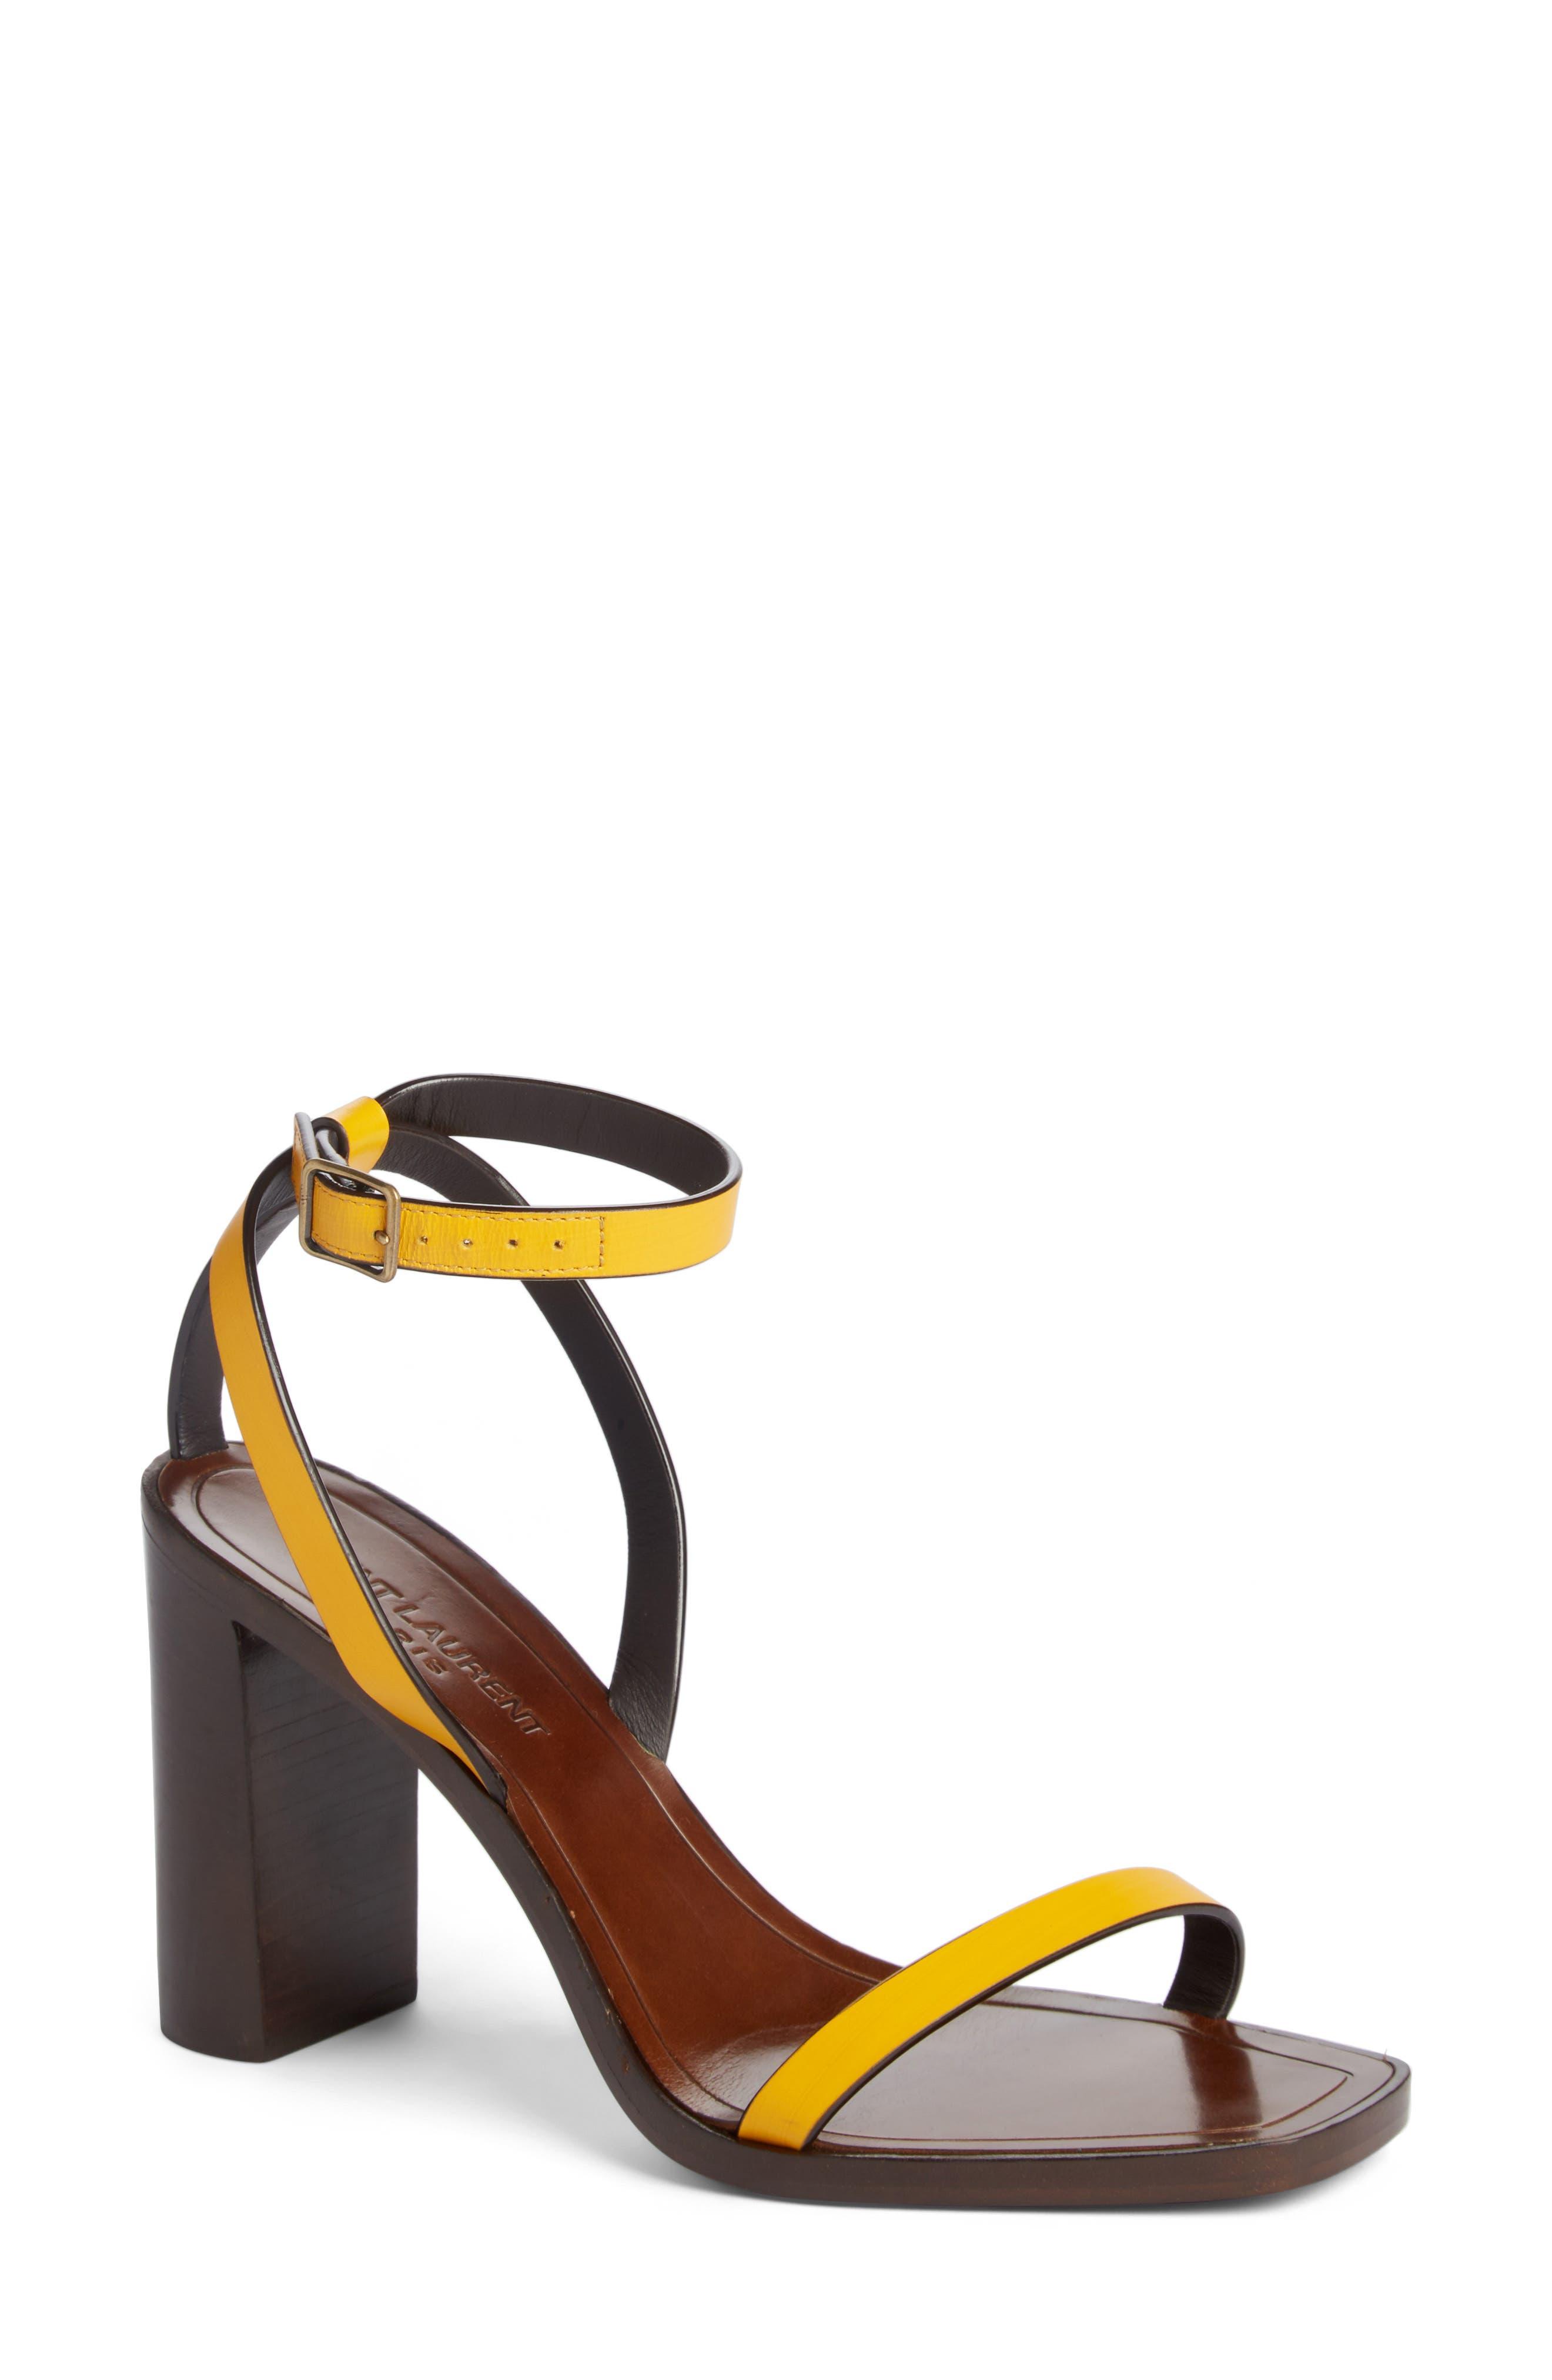 Alternate Image 1 Selected - Saint Laurent Loulou Ankle Strap Sandal (Women)